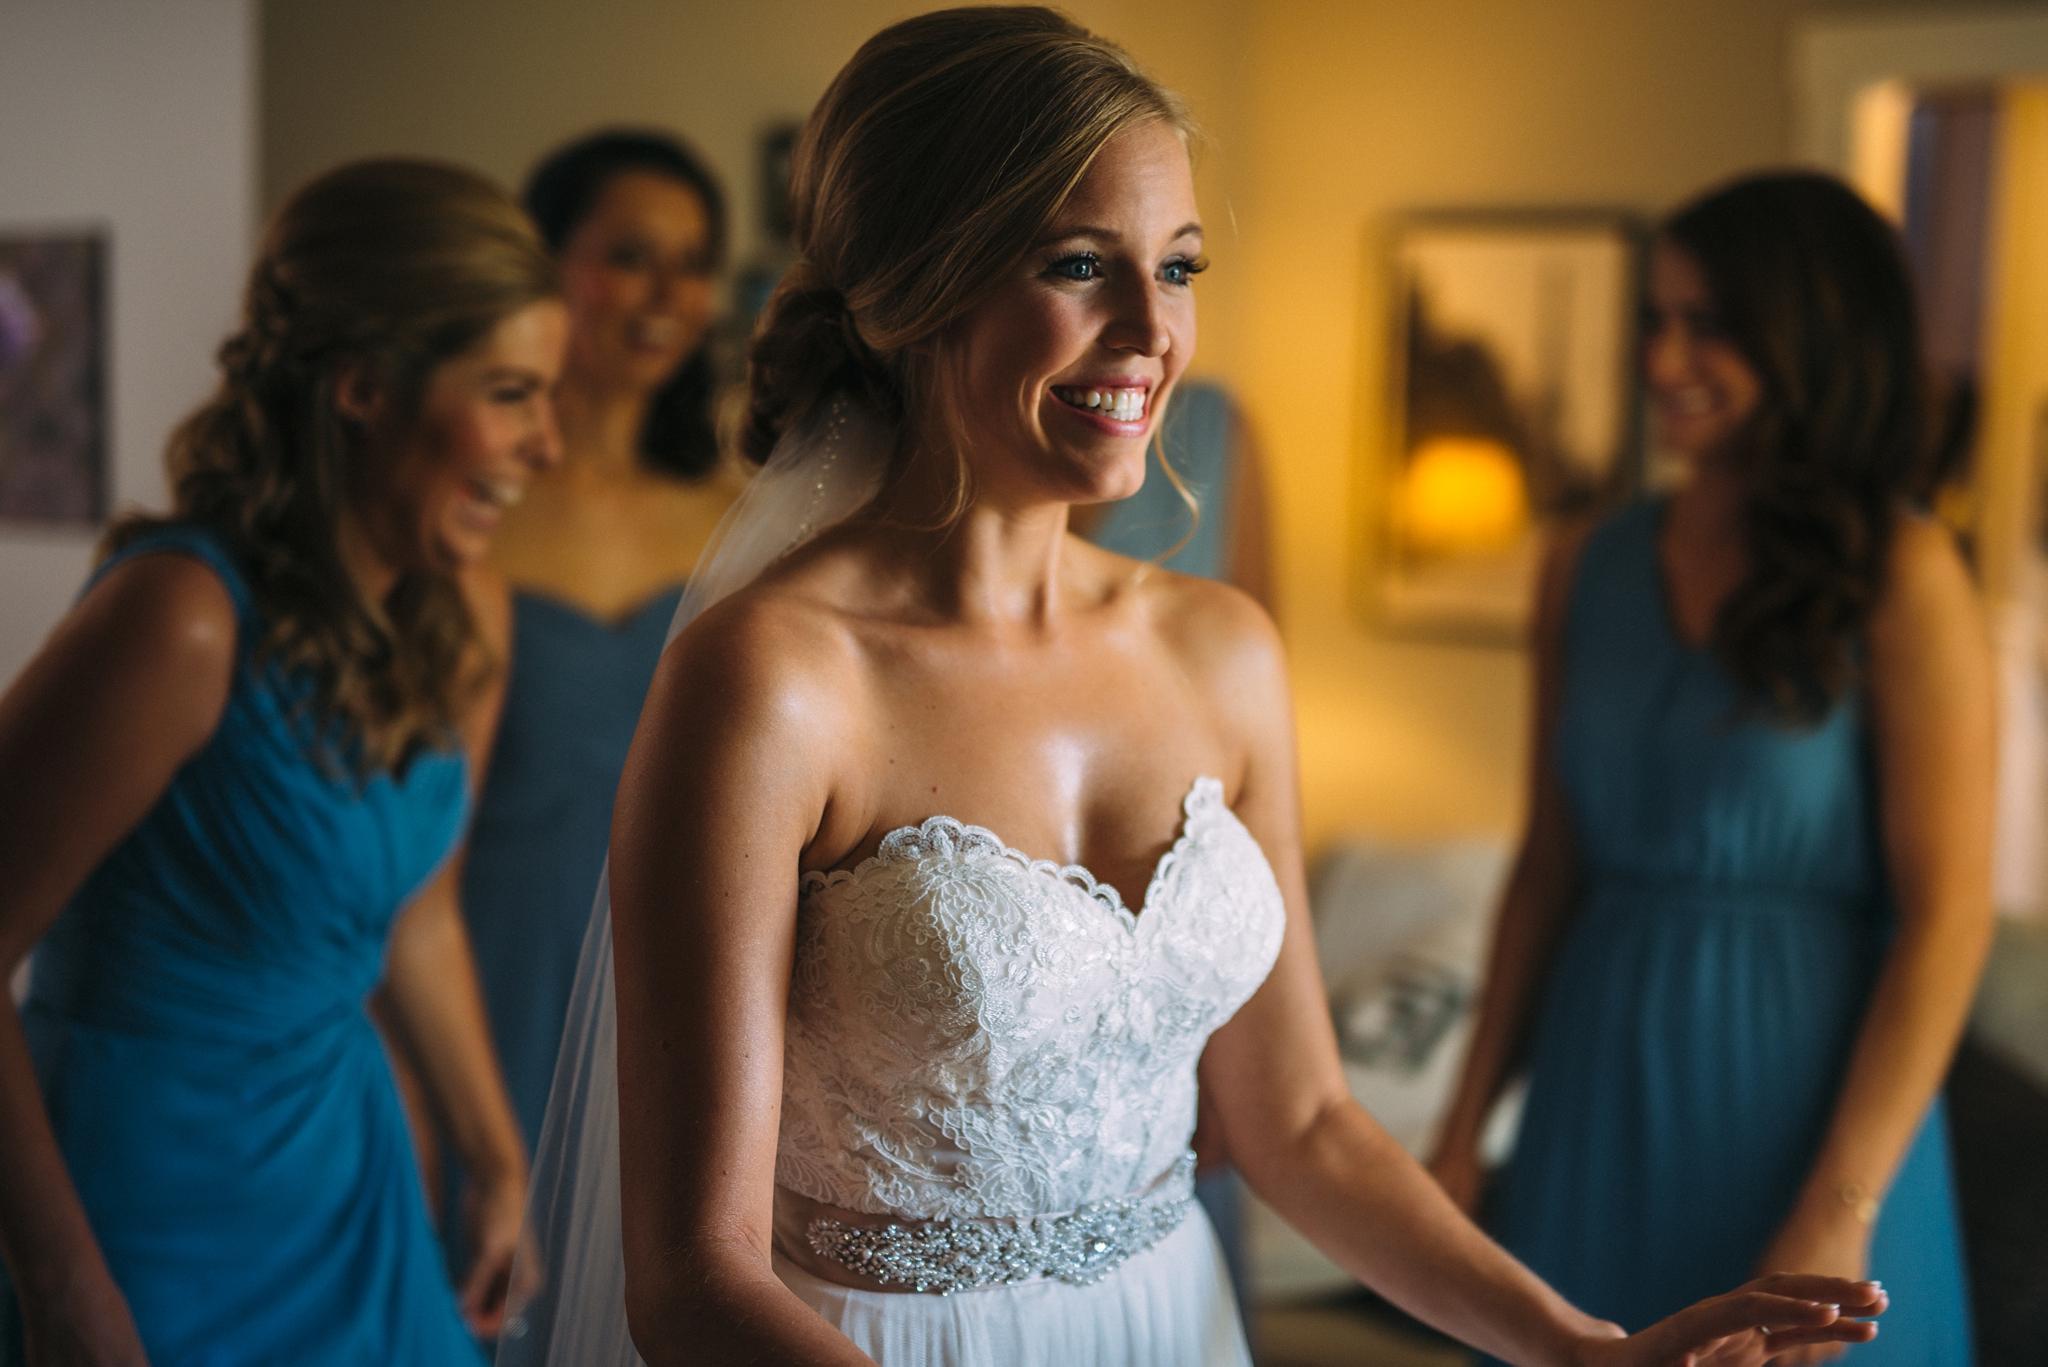 kaihla_tonai_intimate_wedding_elopement_photographer_2872